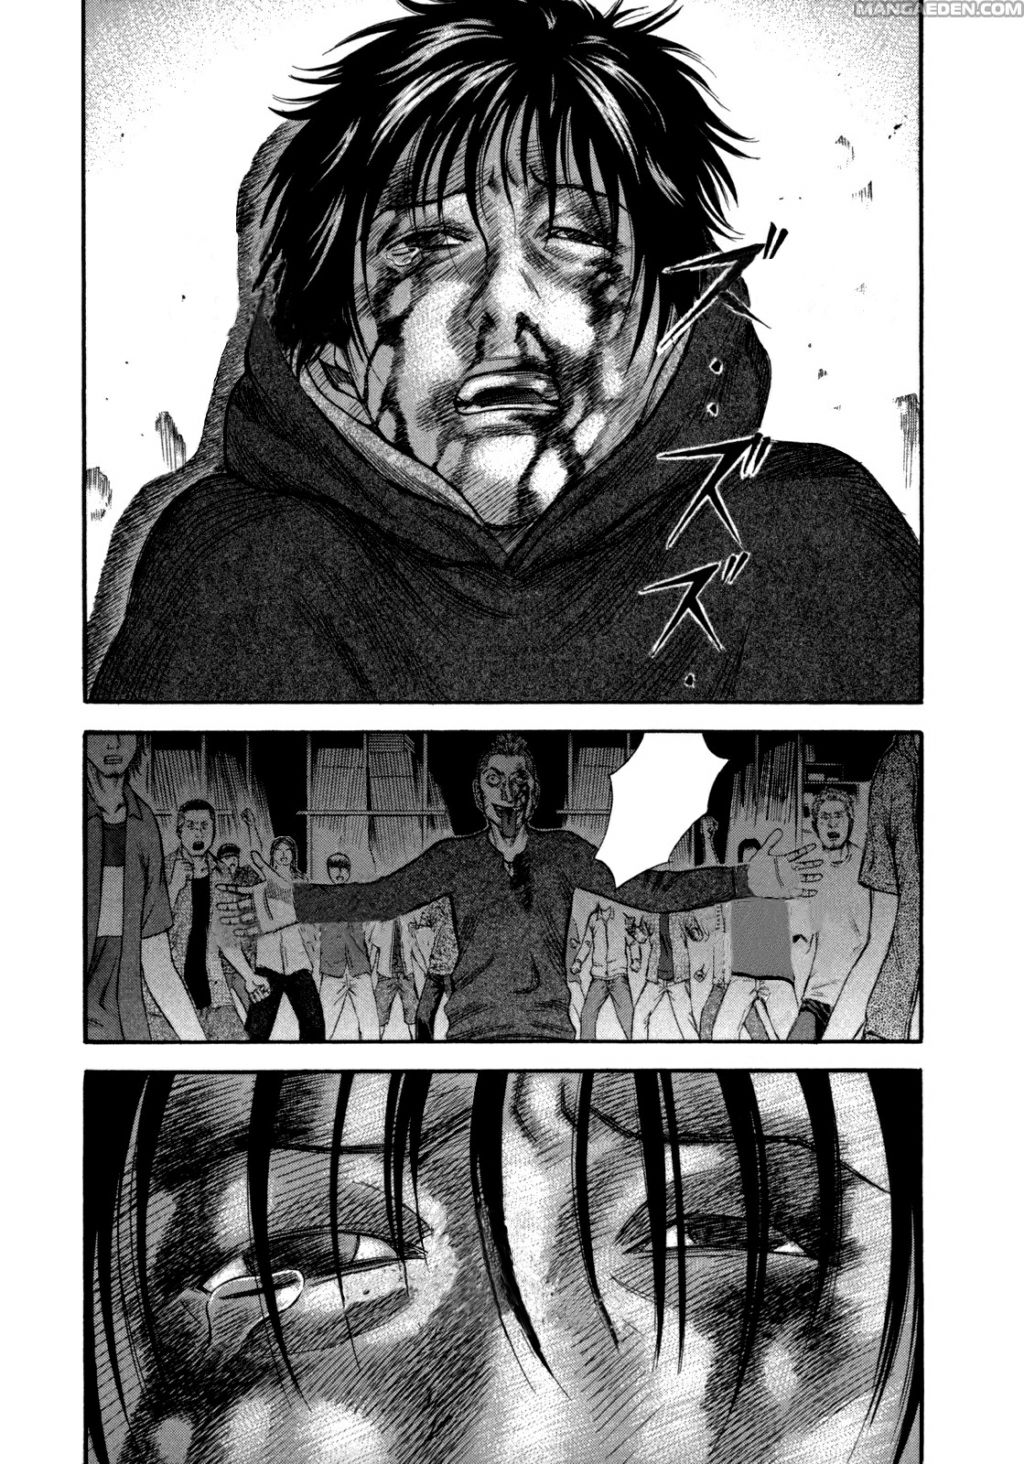 × Dark Storm × .. حيـن تعـصـف ريـآح الـإبدآع ! | فريق ترجمة المانجا - صفحة 20 Psfix_11